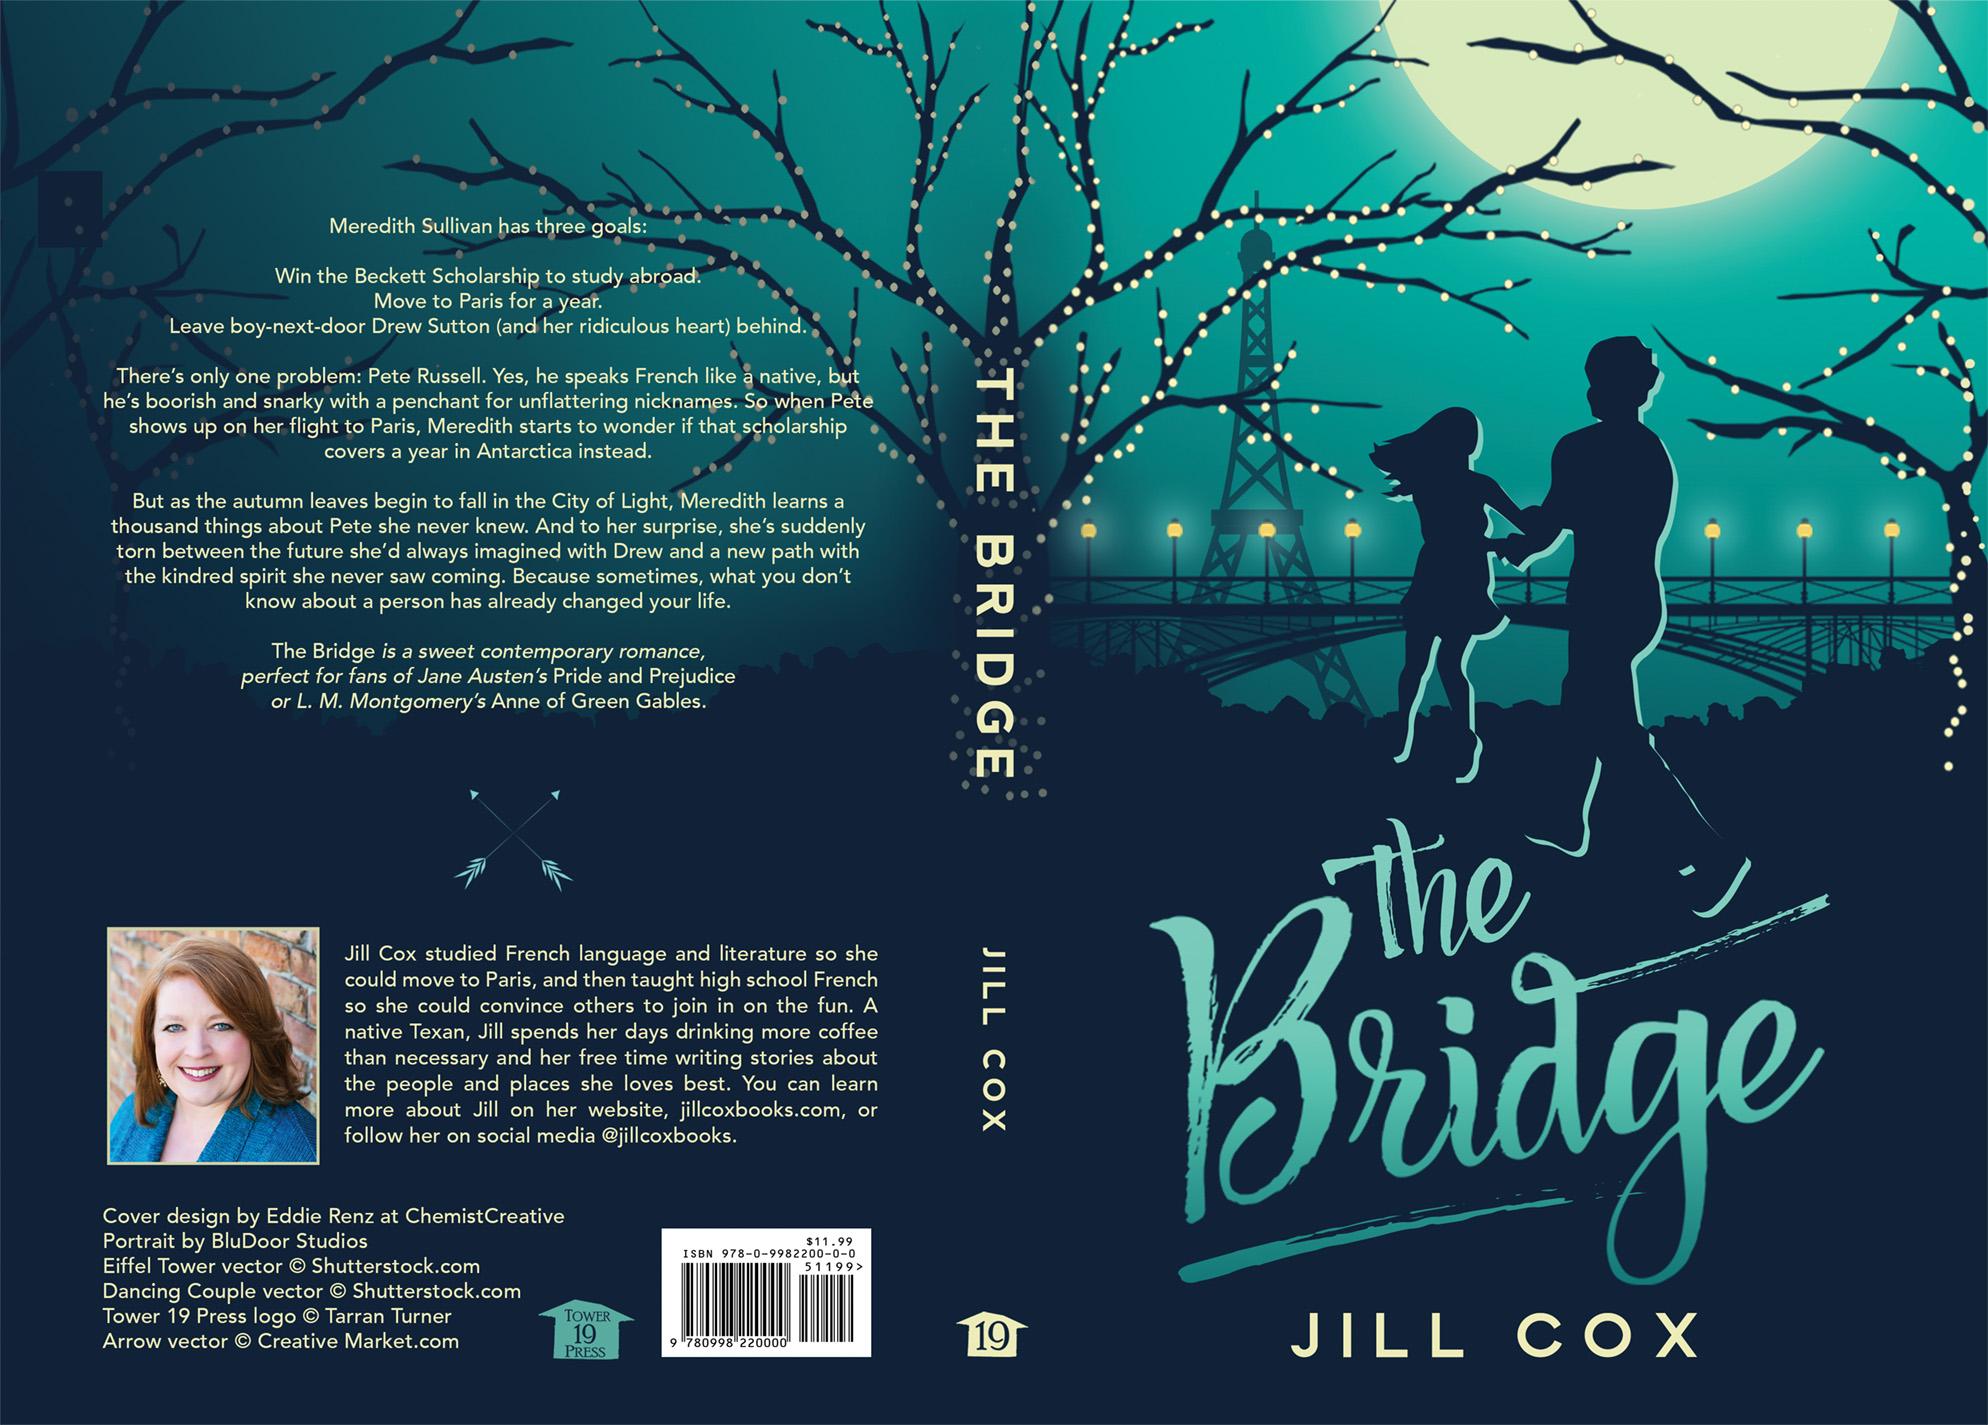 New Book Cover for The Bridge | ChemistCreative